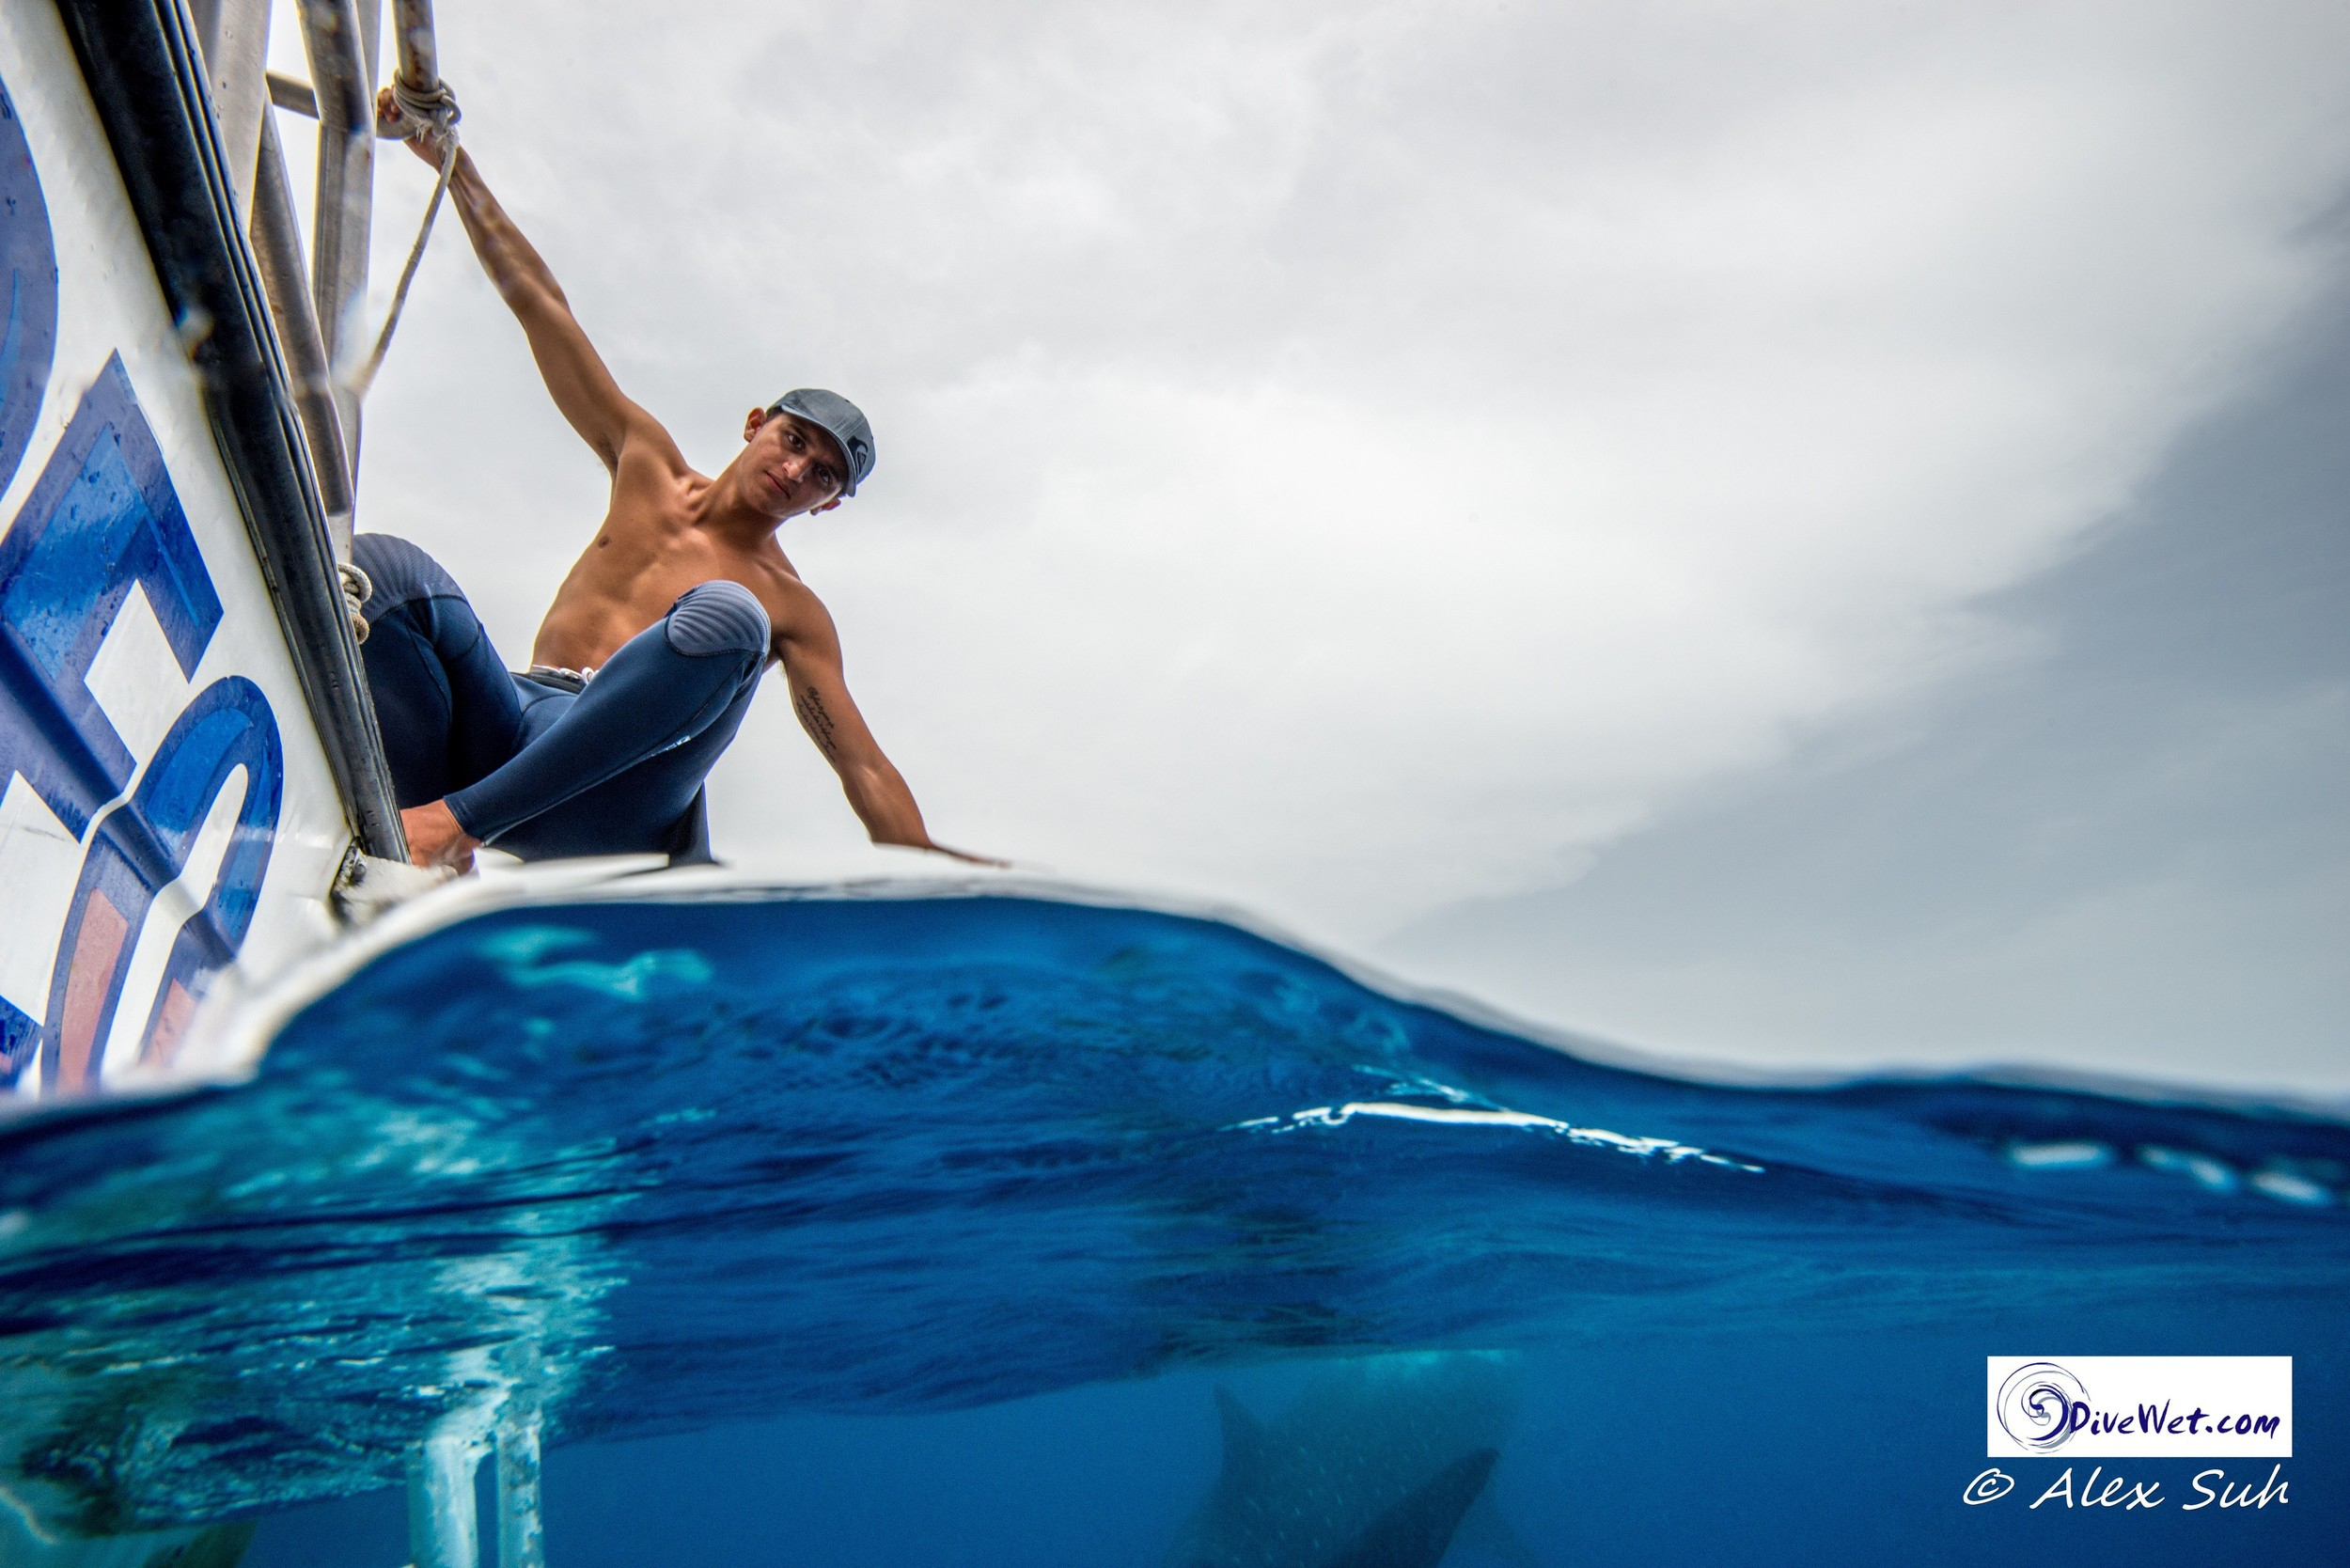 Over Under of Edoardo While Whale Shark Passes